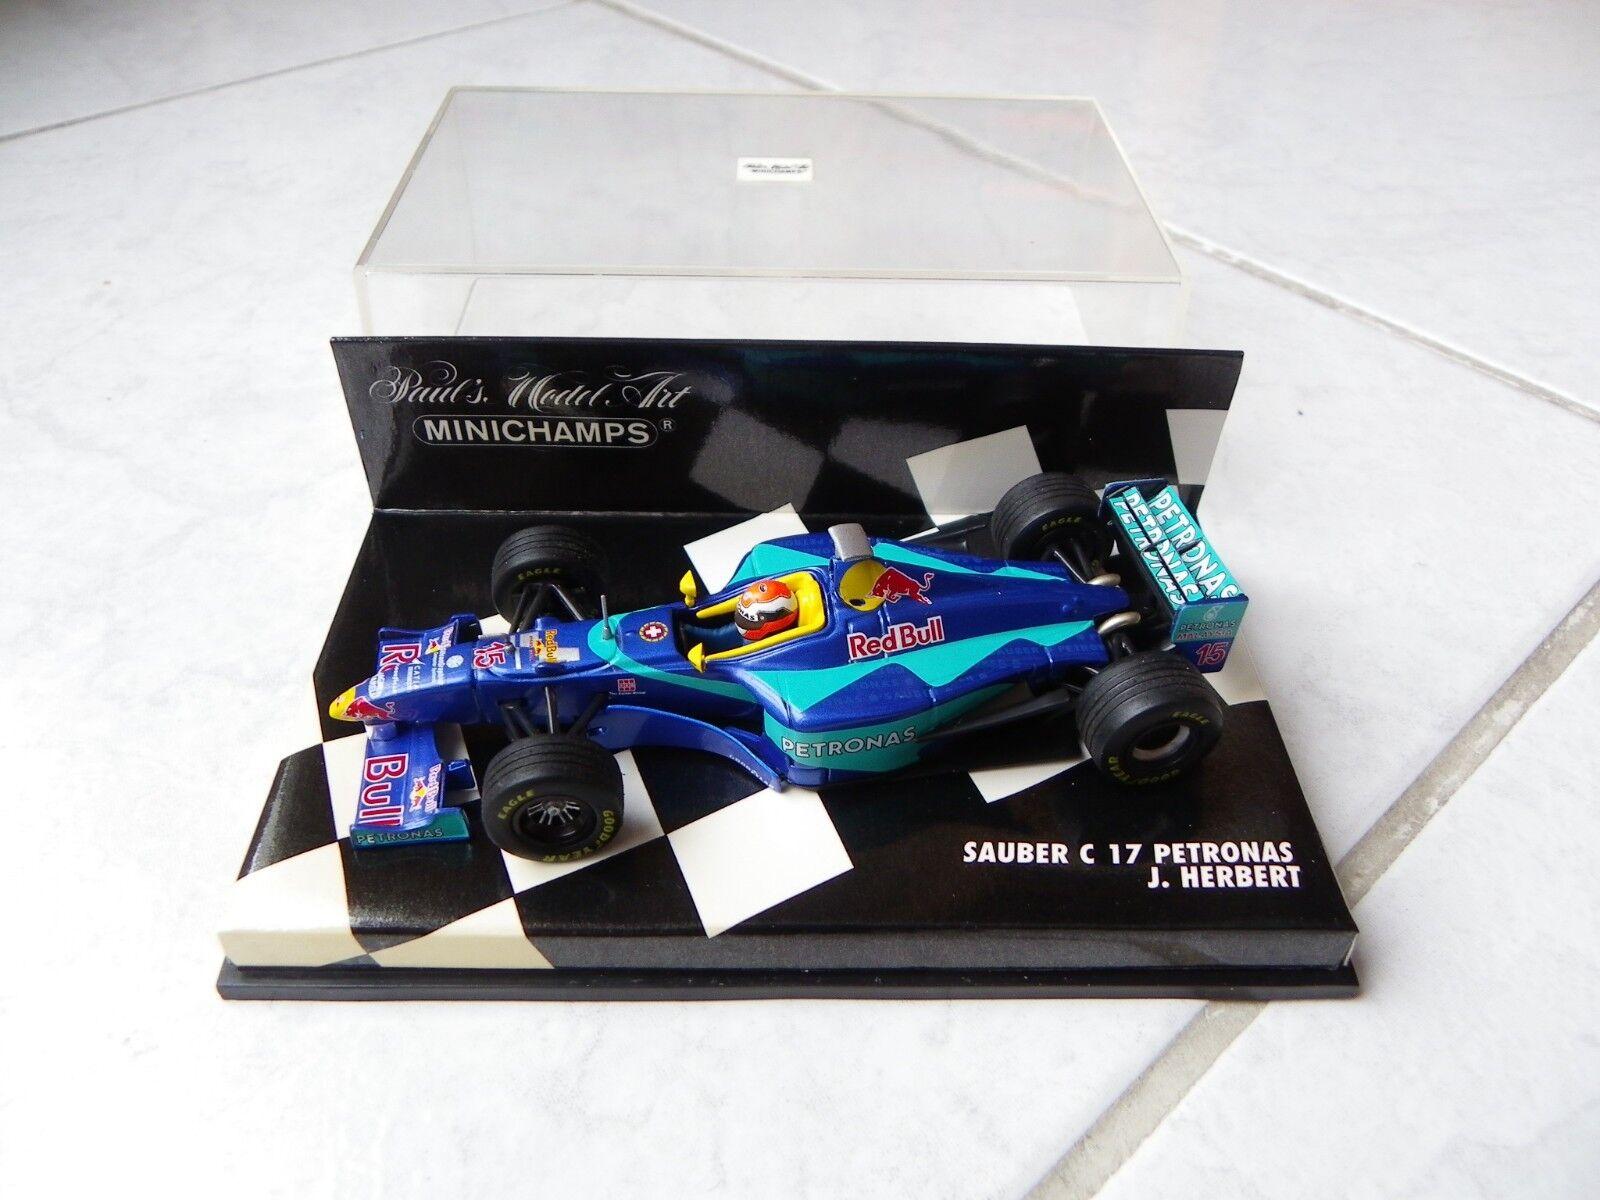 Sauber Petronas C17 Johnny Herbert Minichamps 1 43 1998 F1 Formula 1